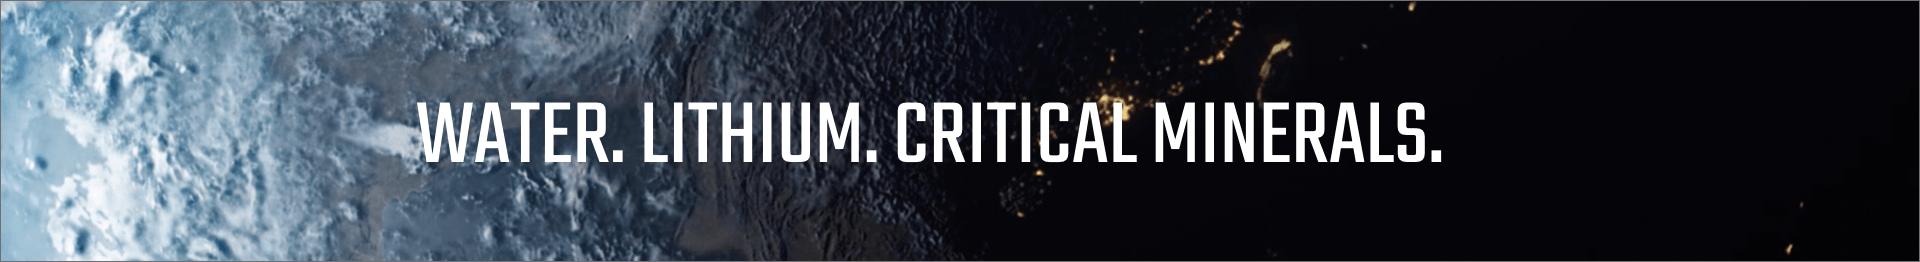 water, lithium, critical minerals